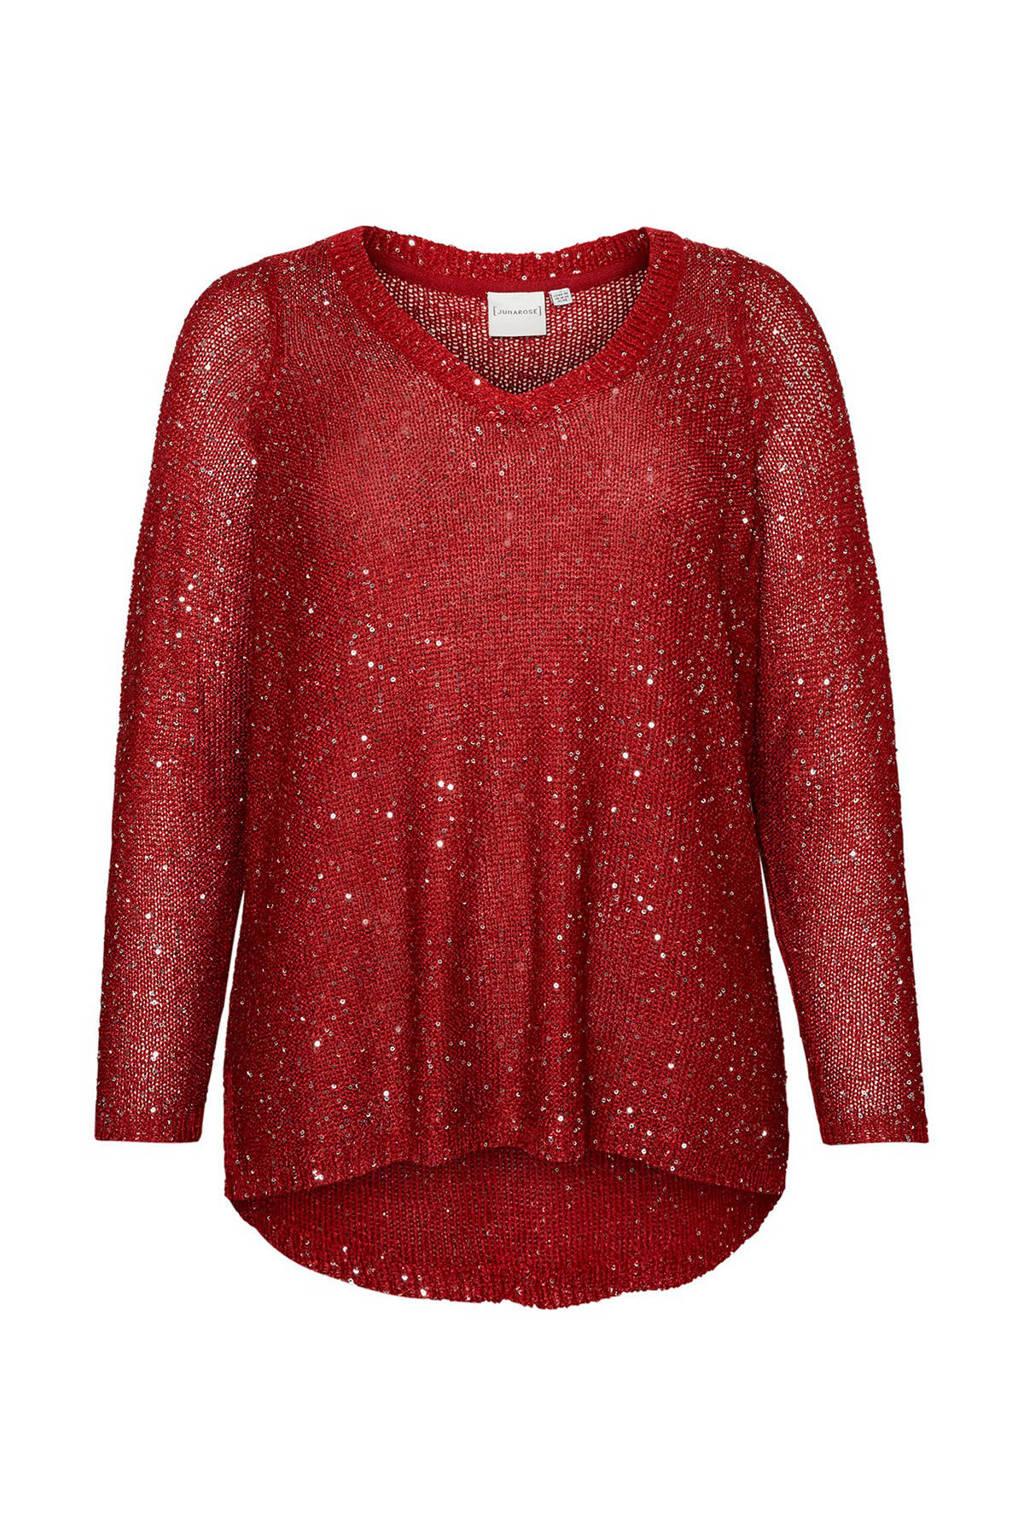 JUNAROSE trui Pilou met pailletten rood, Rood